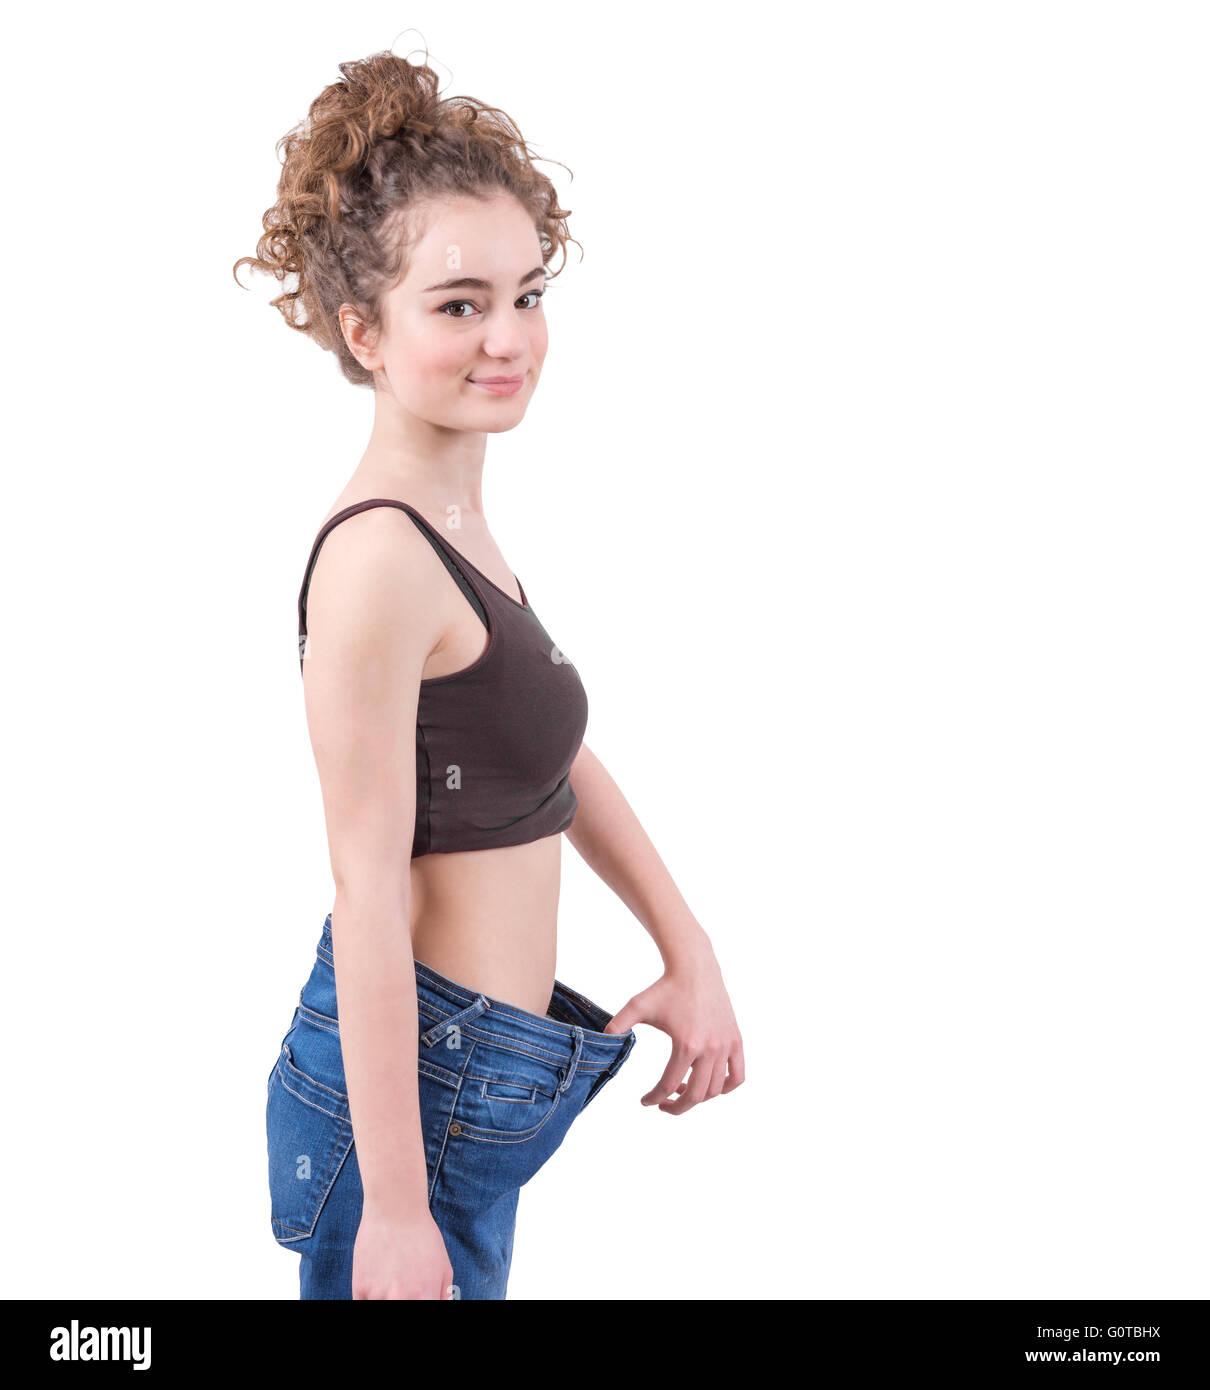 Molto skinny girl indossando larghi pantaloni jeans Foto